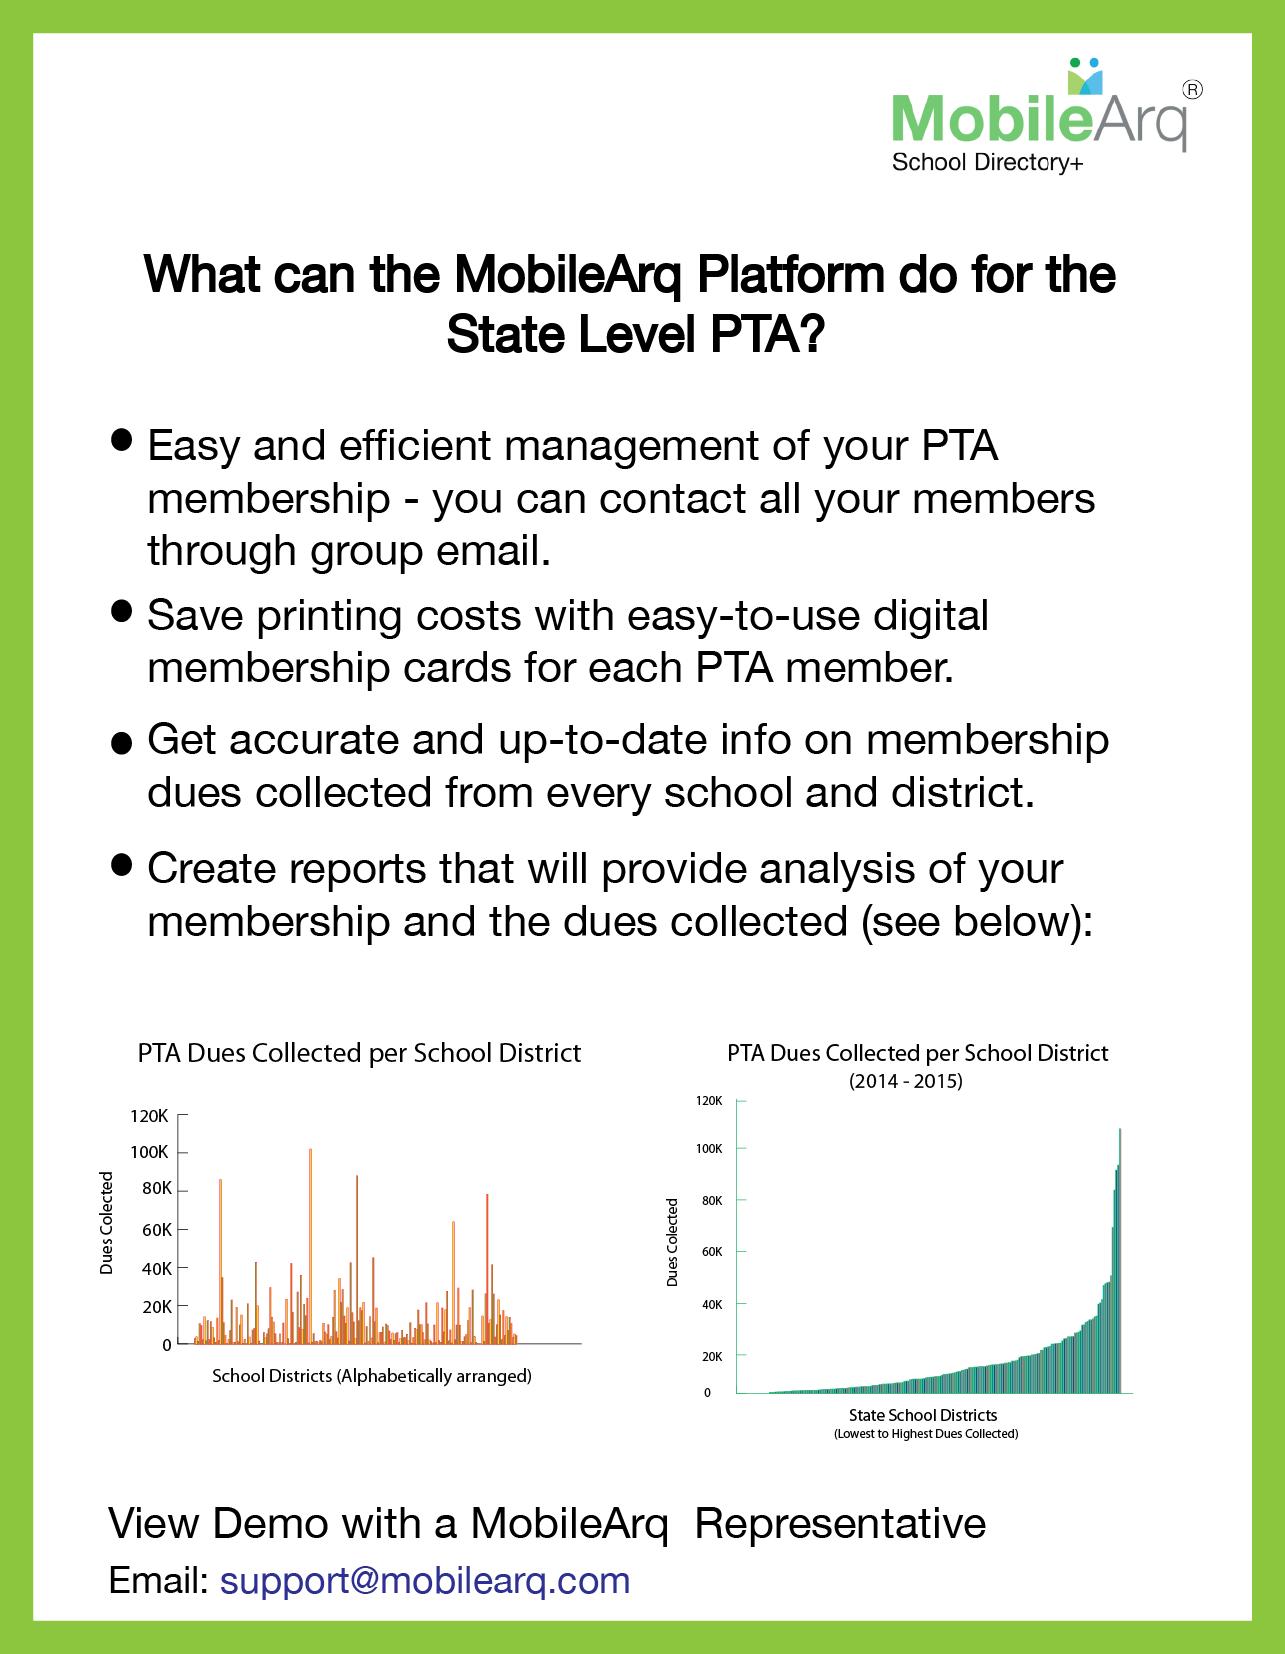 Benefits of using MobileArq Membership Platform for state PTAs